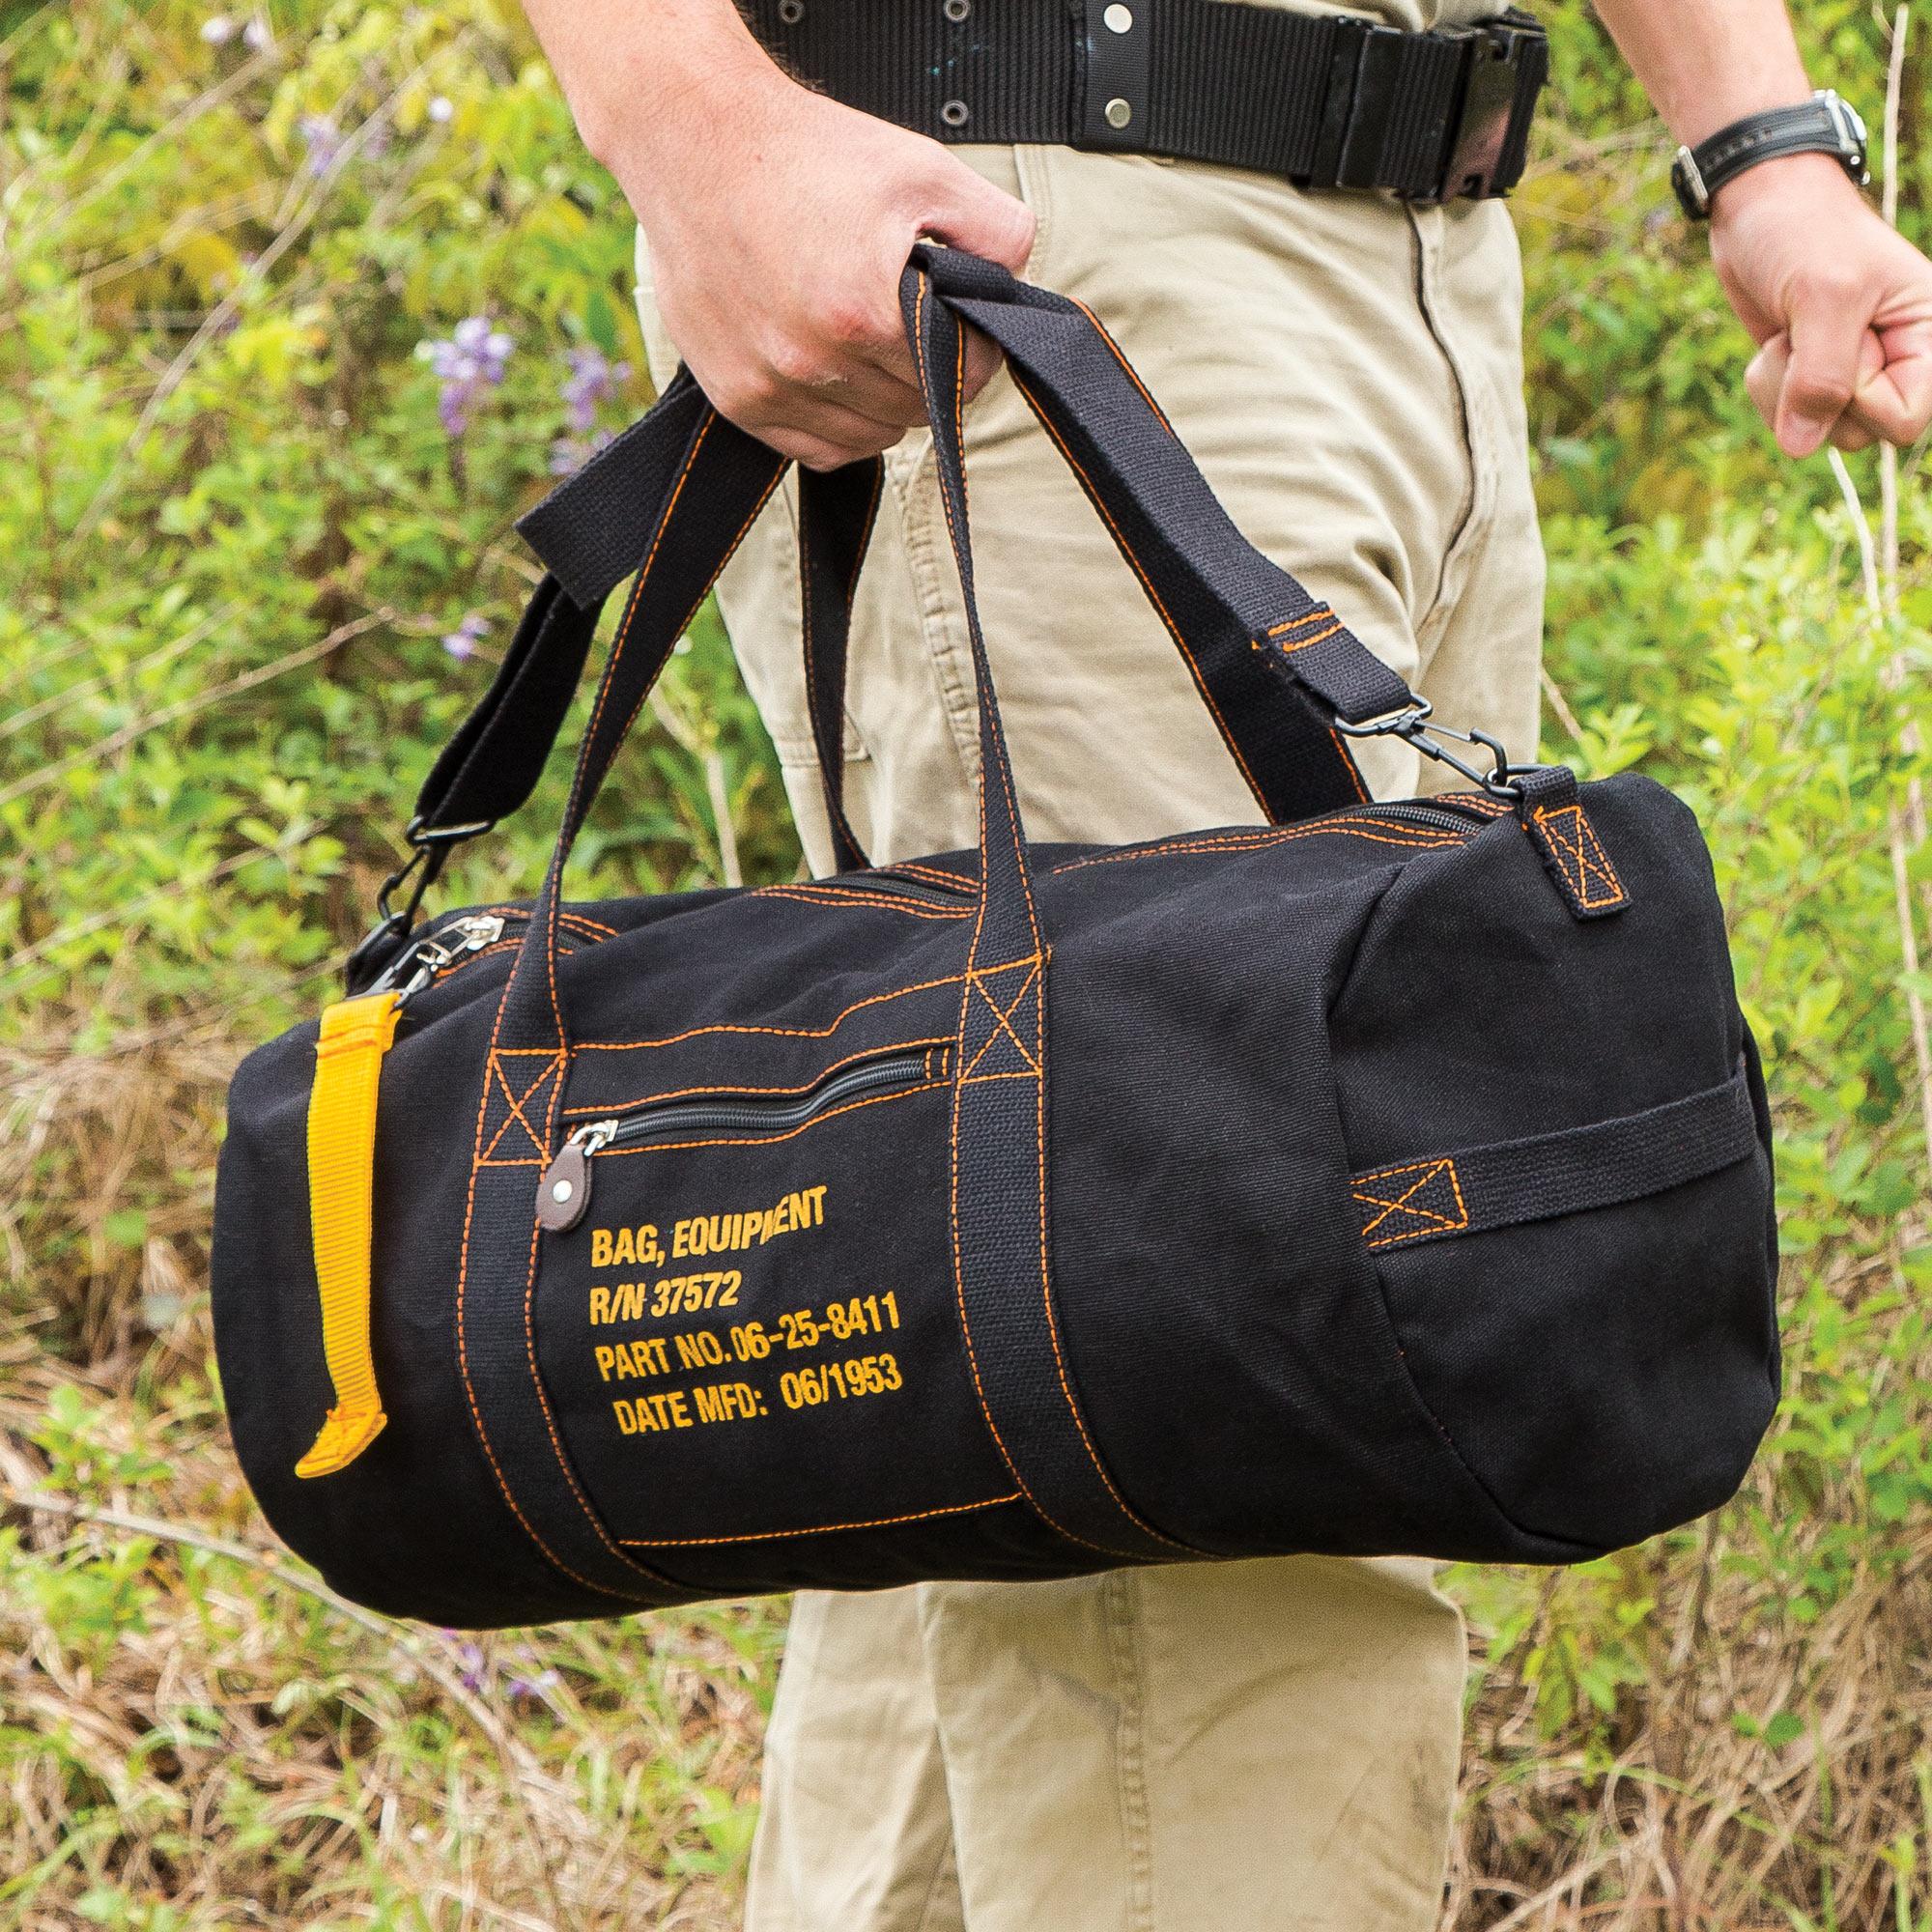 Details about Black Cotton Canvas Travel Equipment Carry Duffle Bag Flight  Adjustable a4b5813fb3532